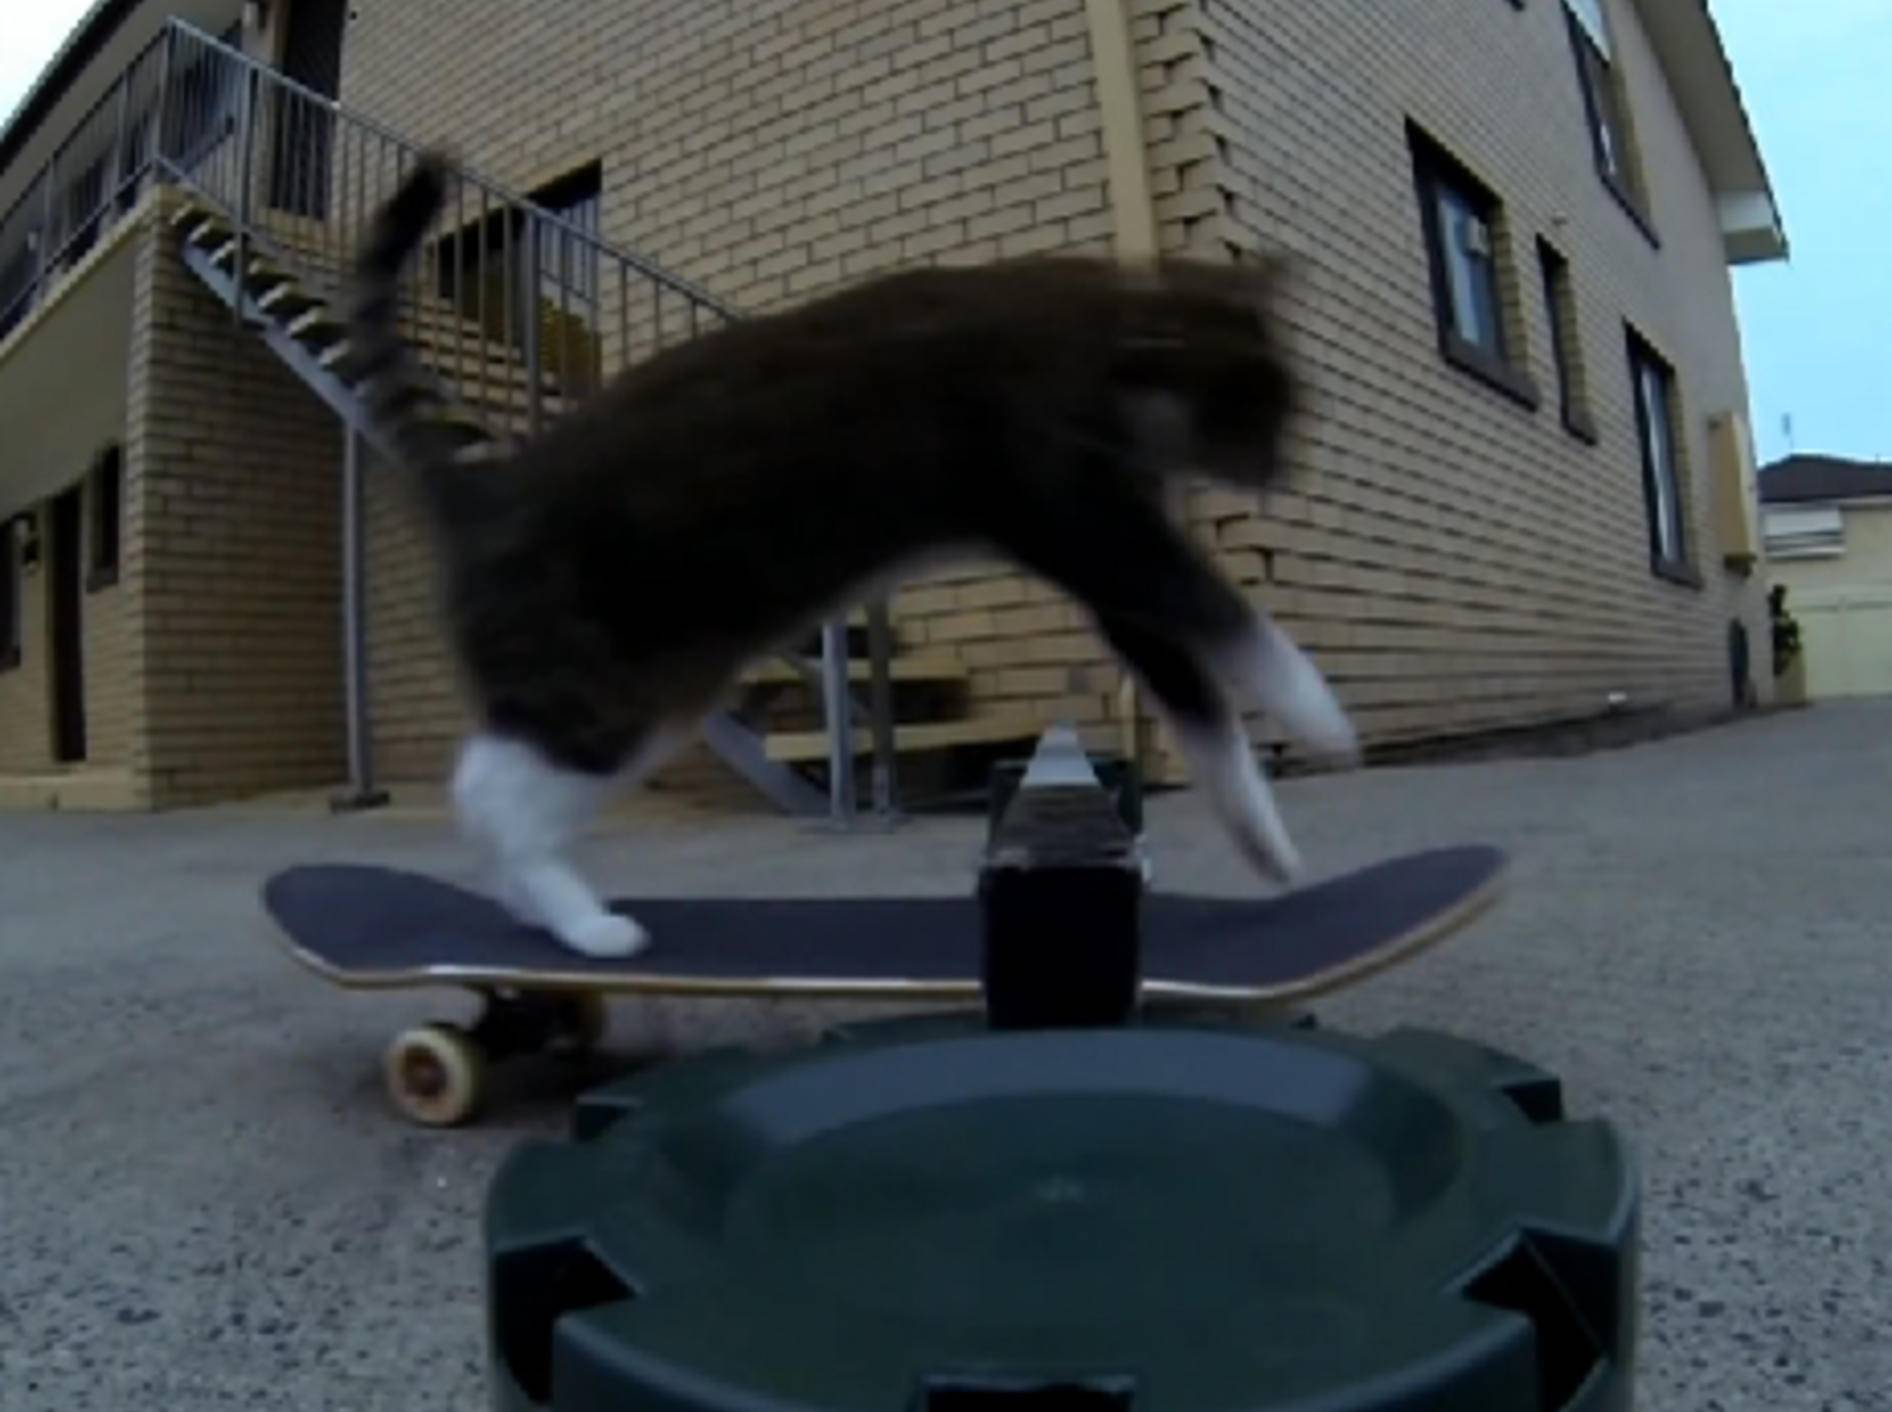 Katze macht Skateboard-Stunt